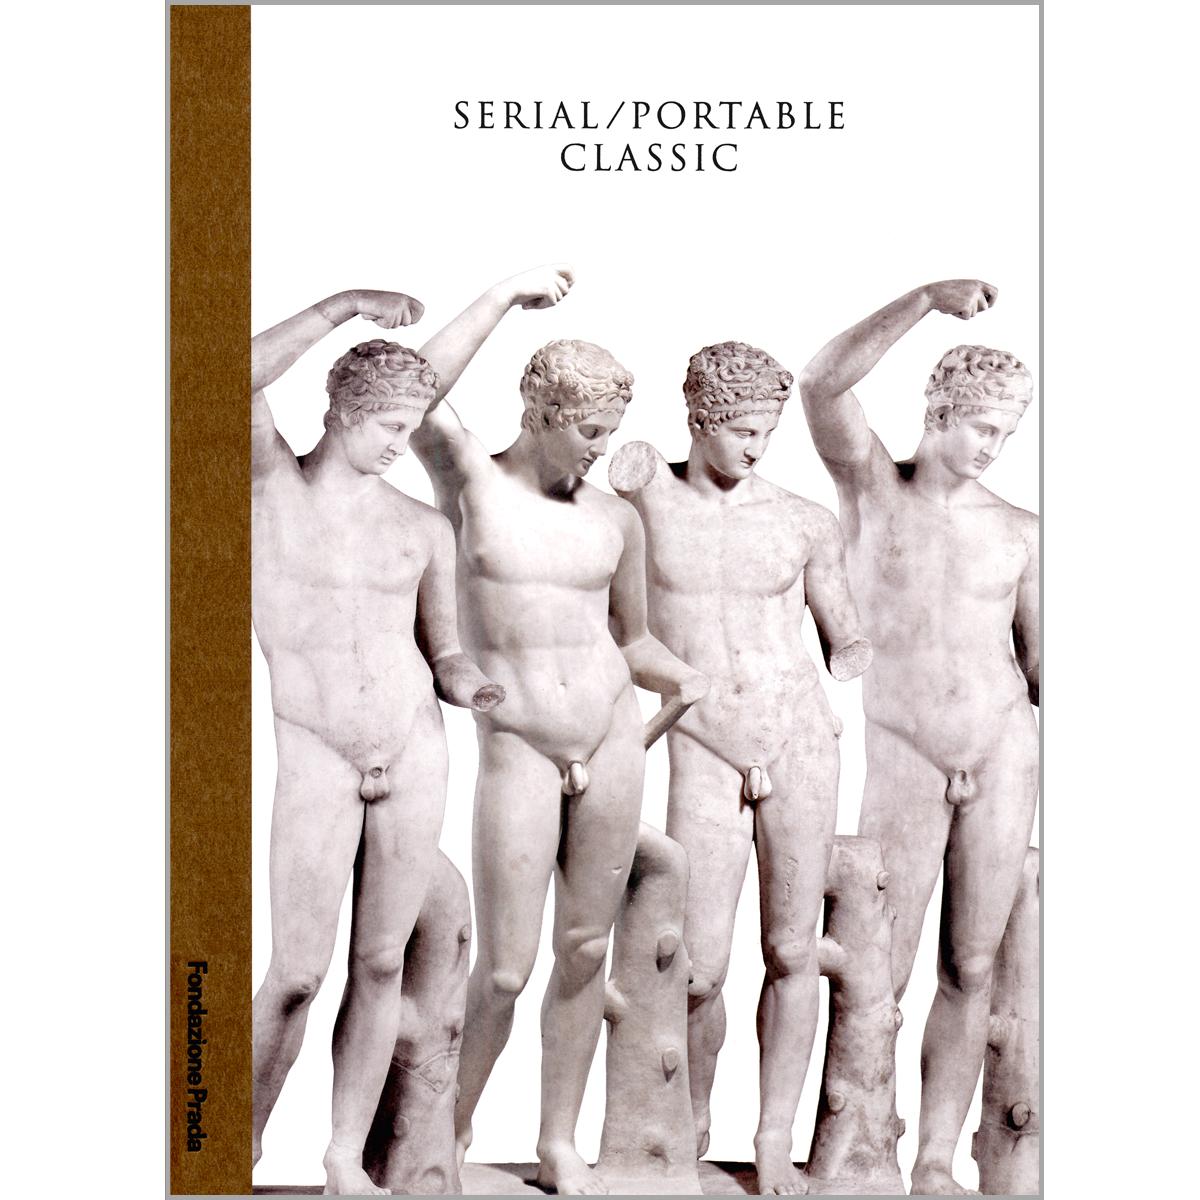 Serial/Portable Classic